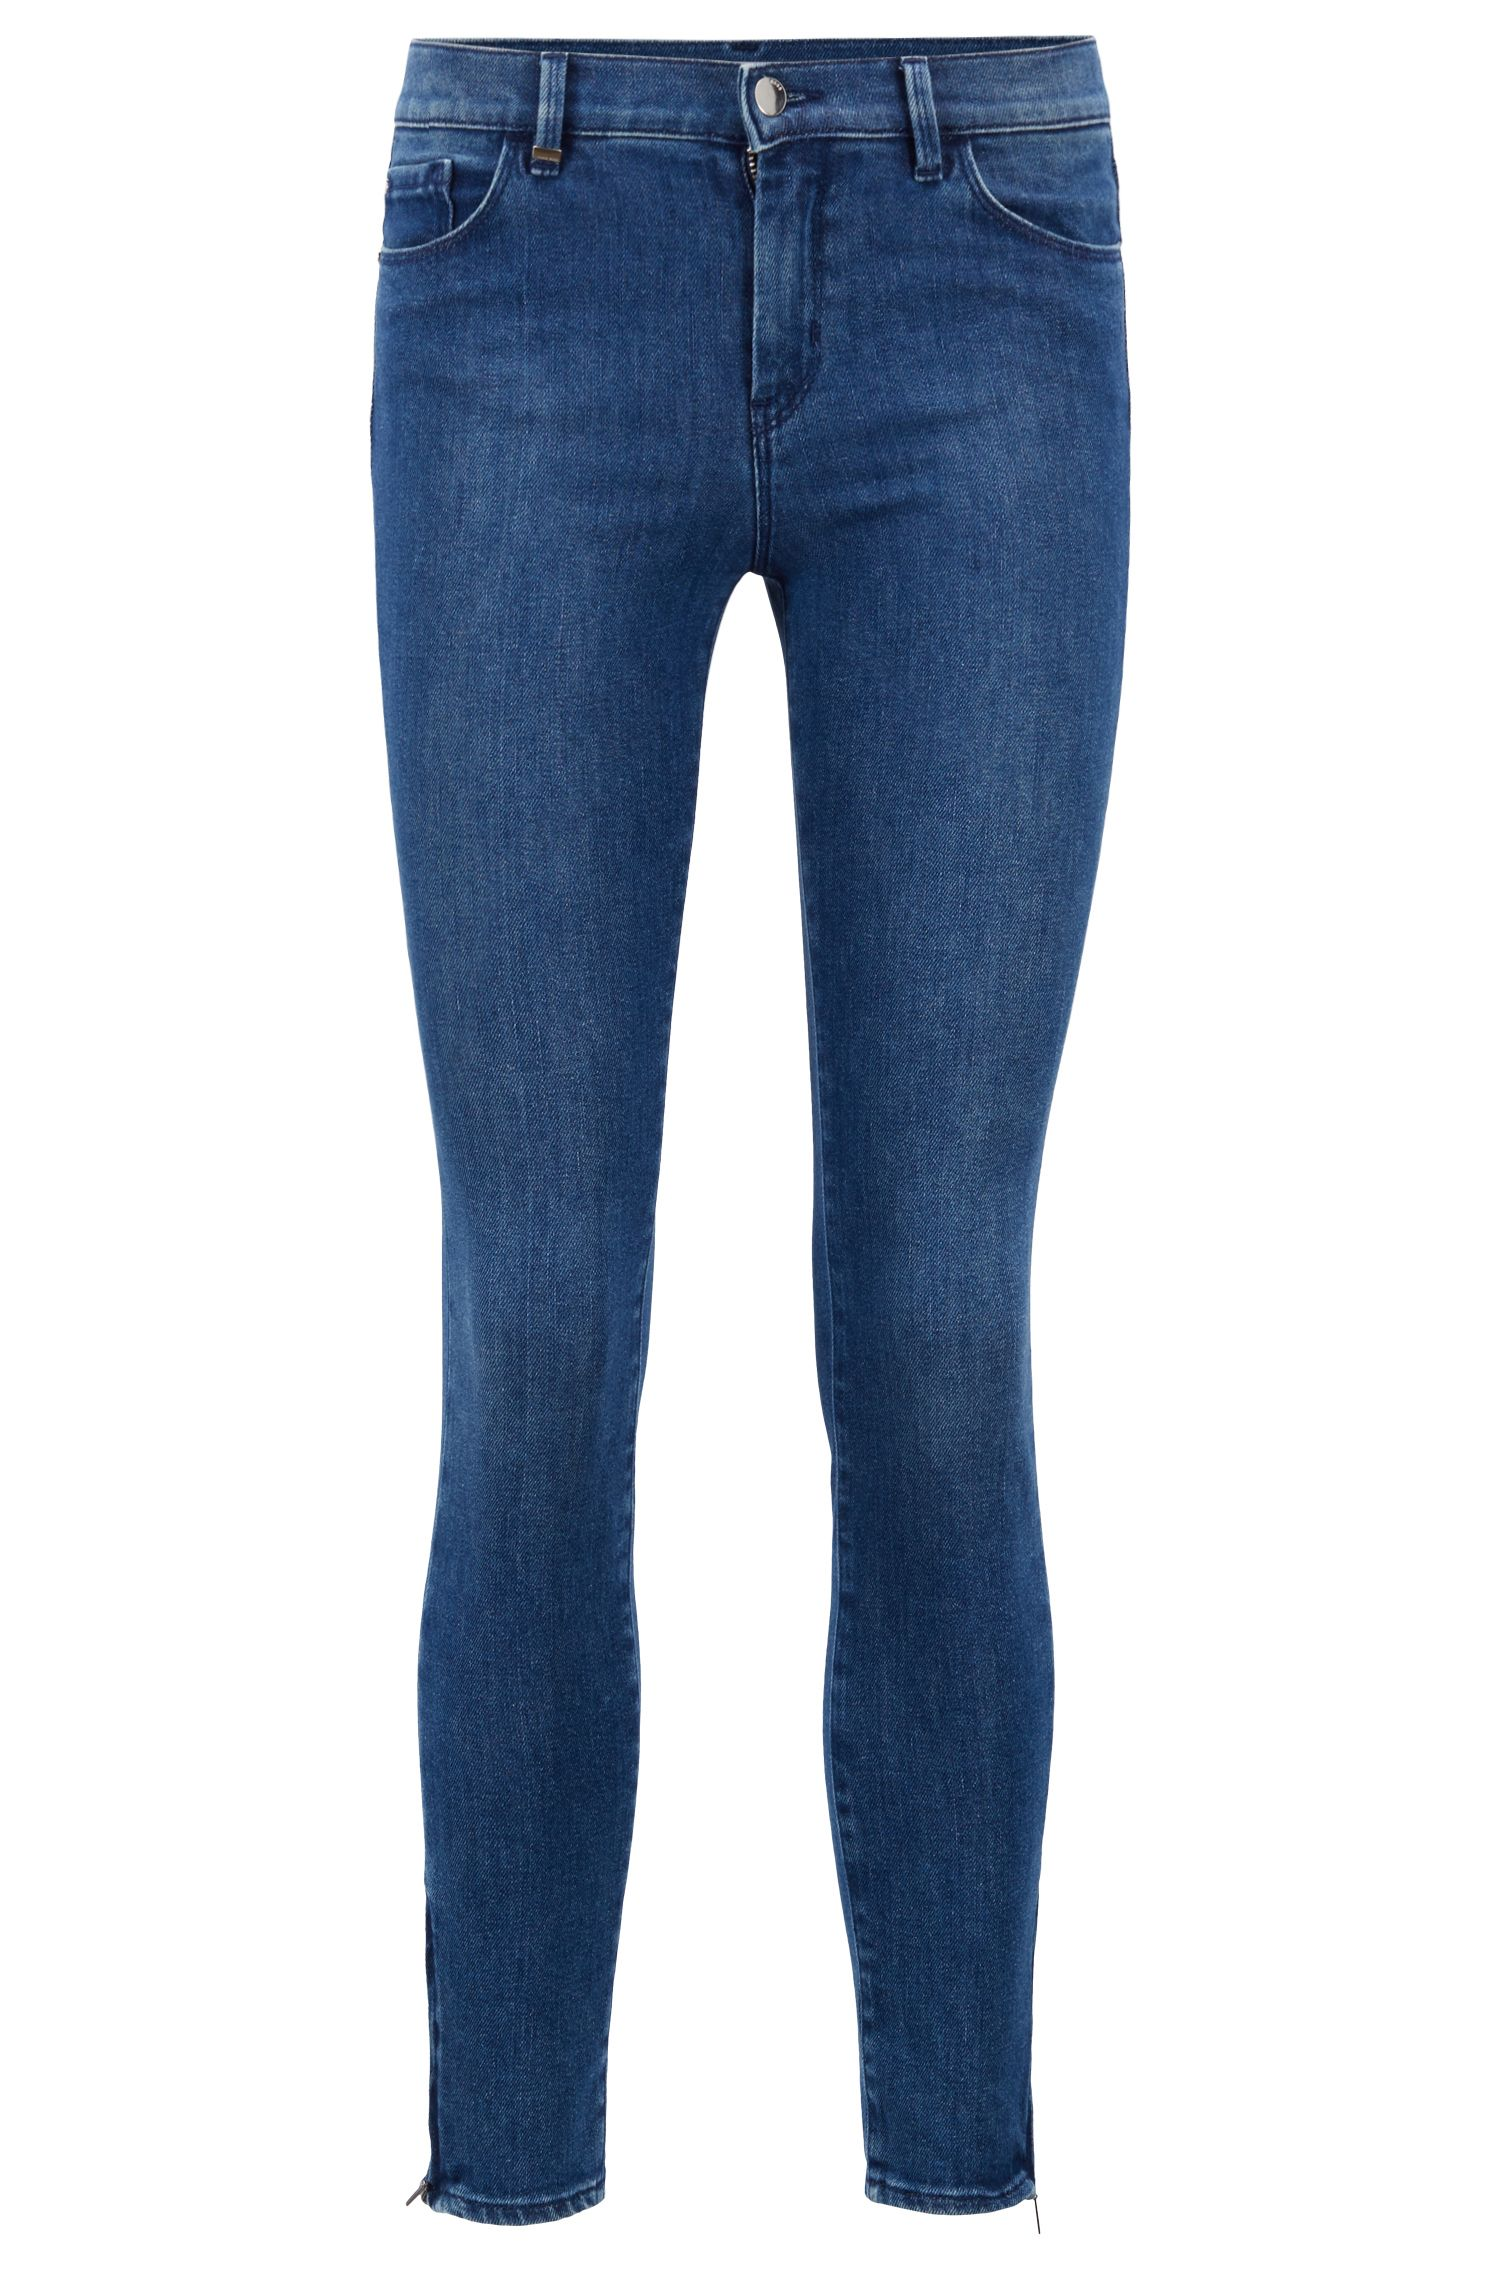 Hugo Boss - Skinny-Fit Jeans aus komfortablem Stretch-Denim - 1